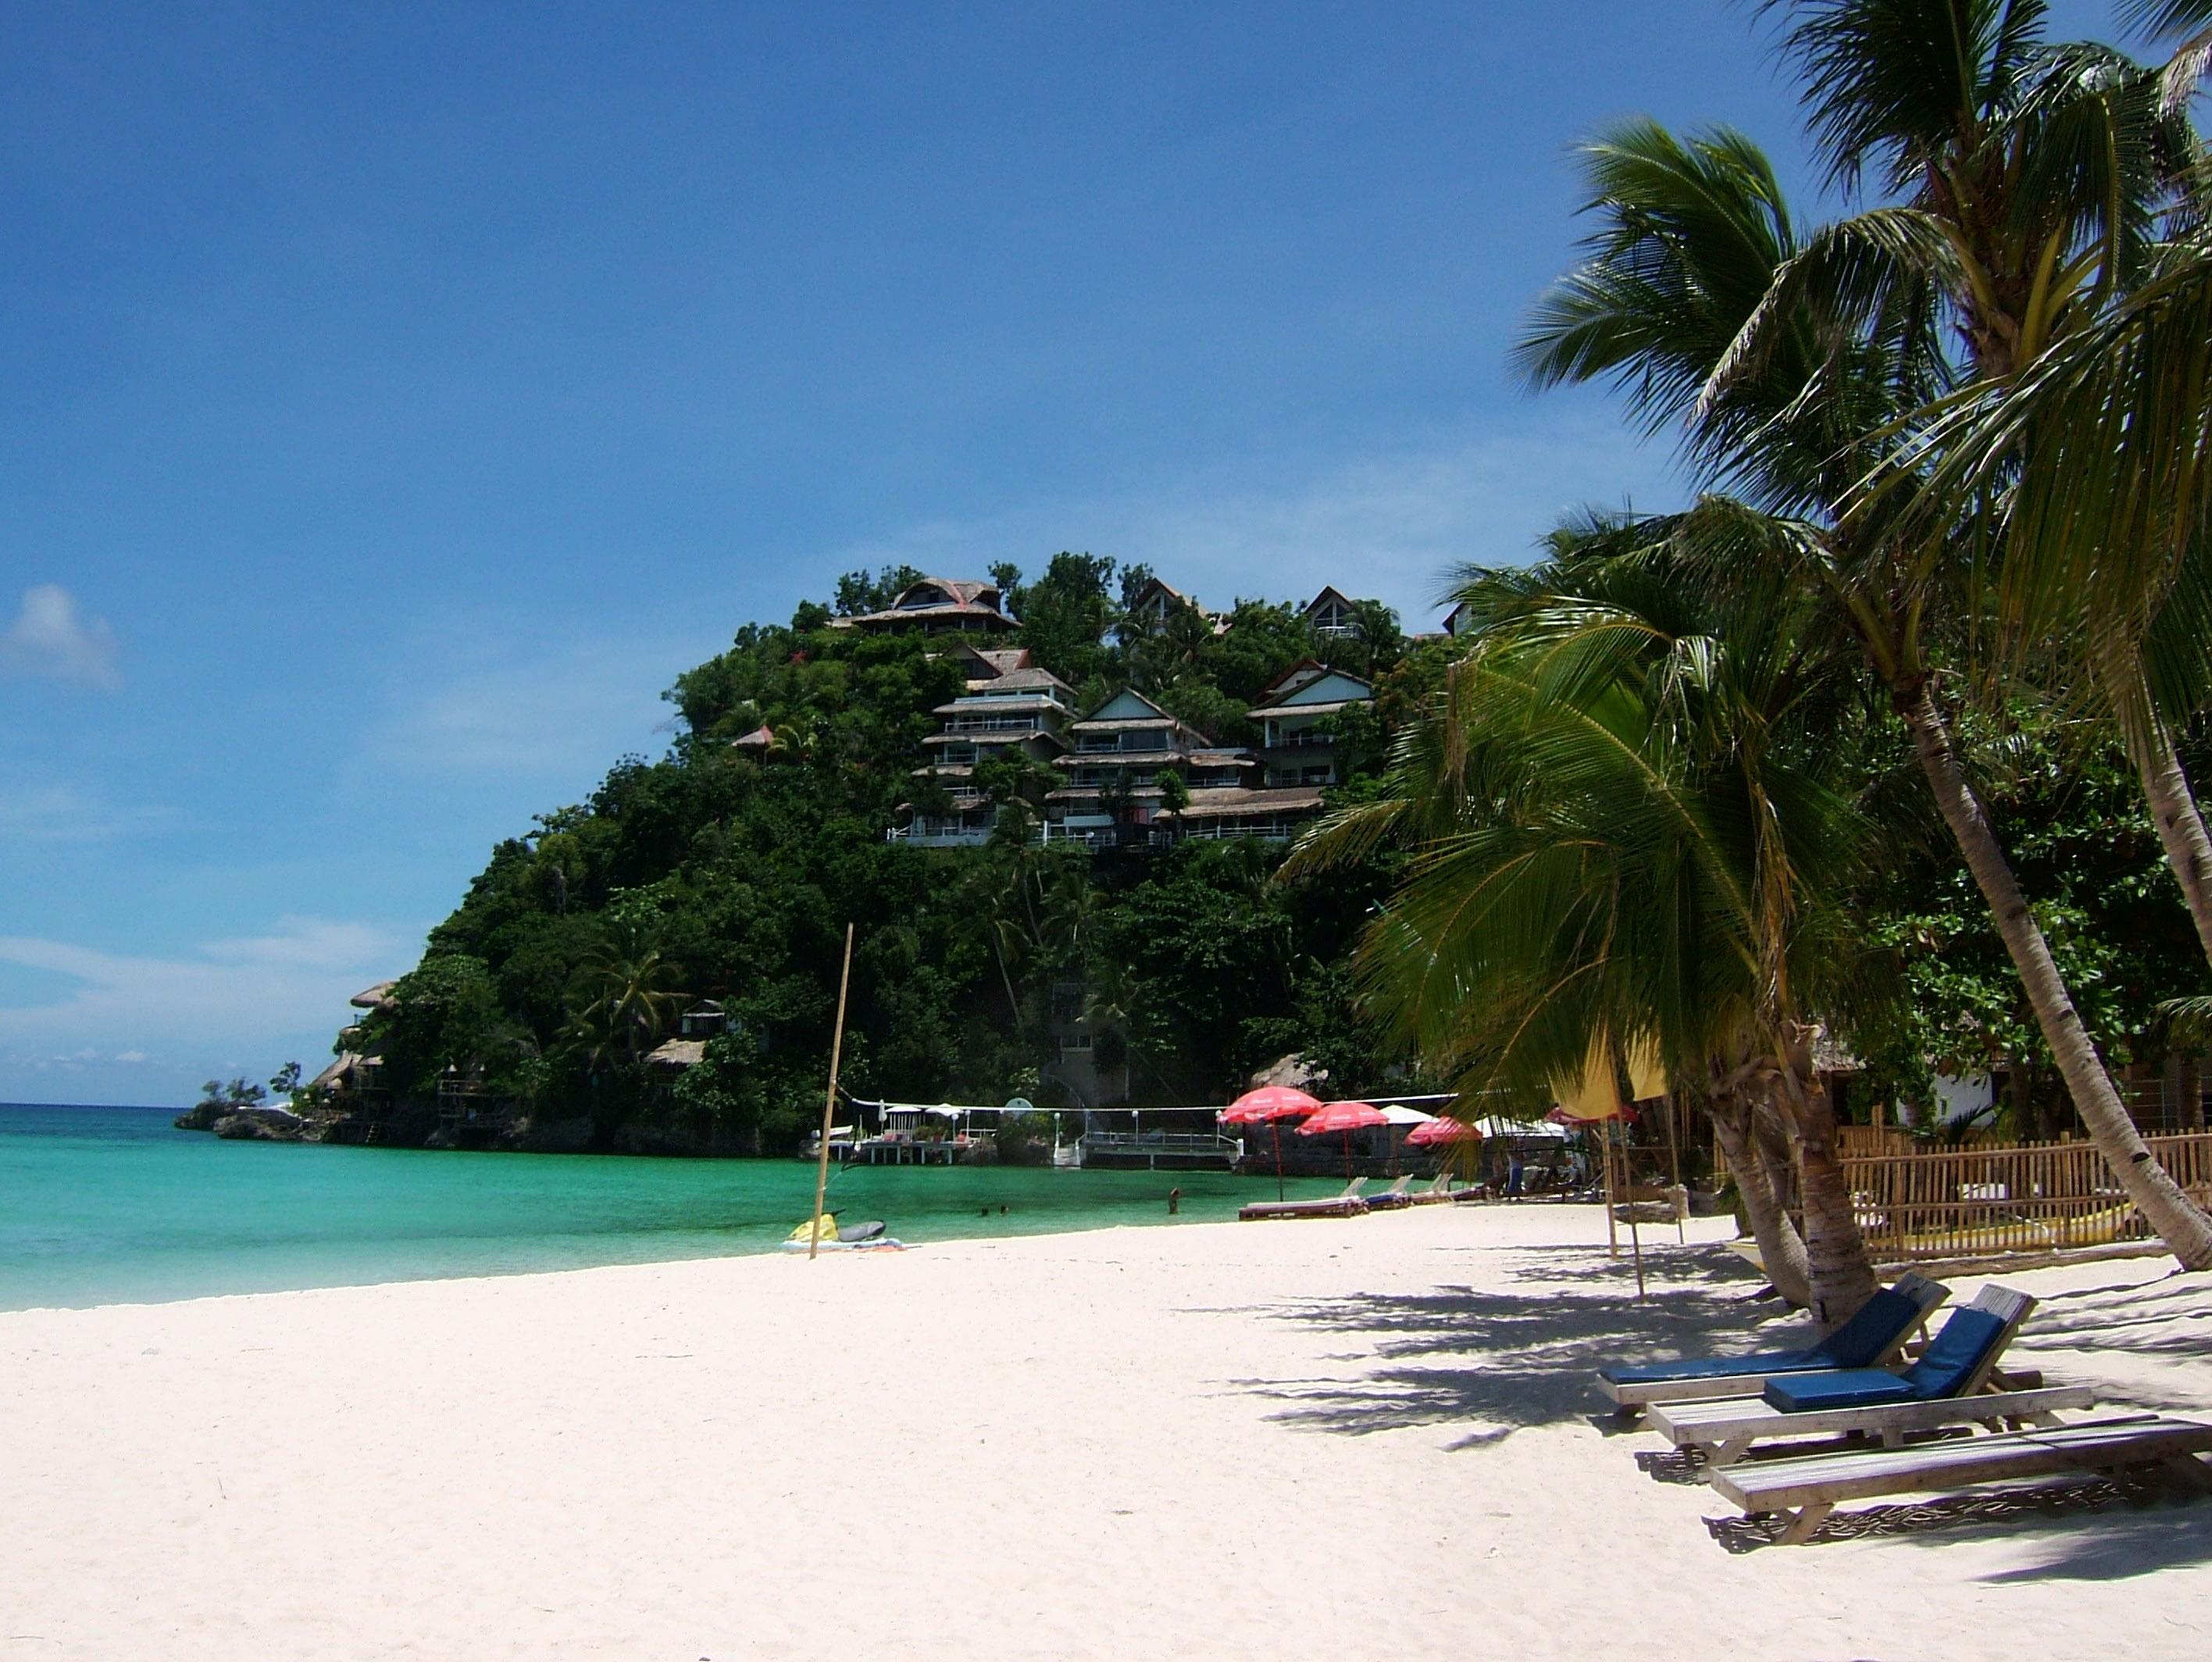 Philippines Sugar Islands Boracay Punta bunga beach Resorts 2007 07